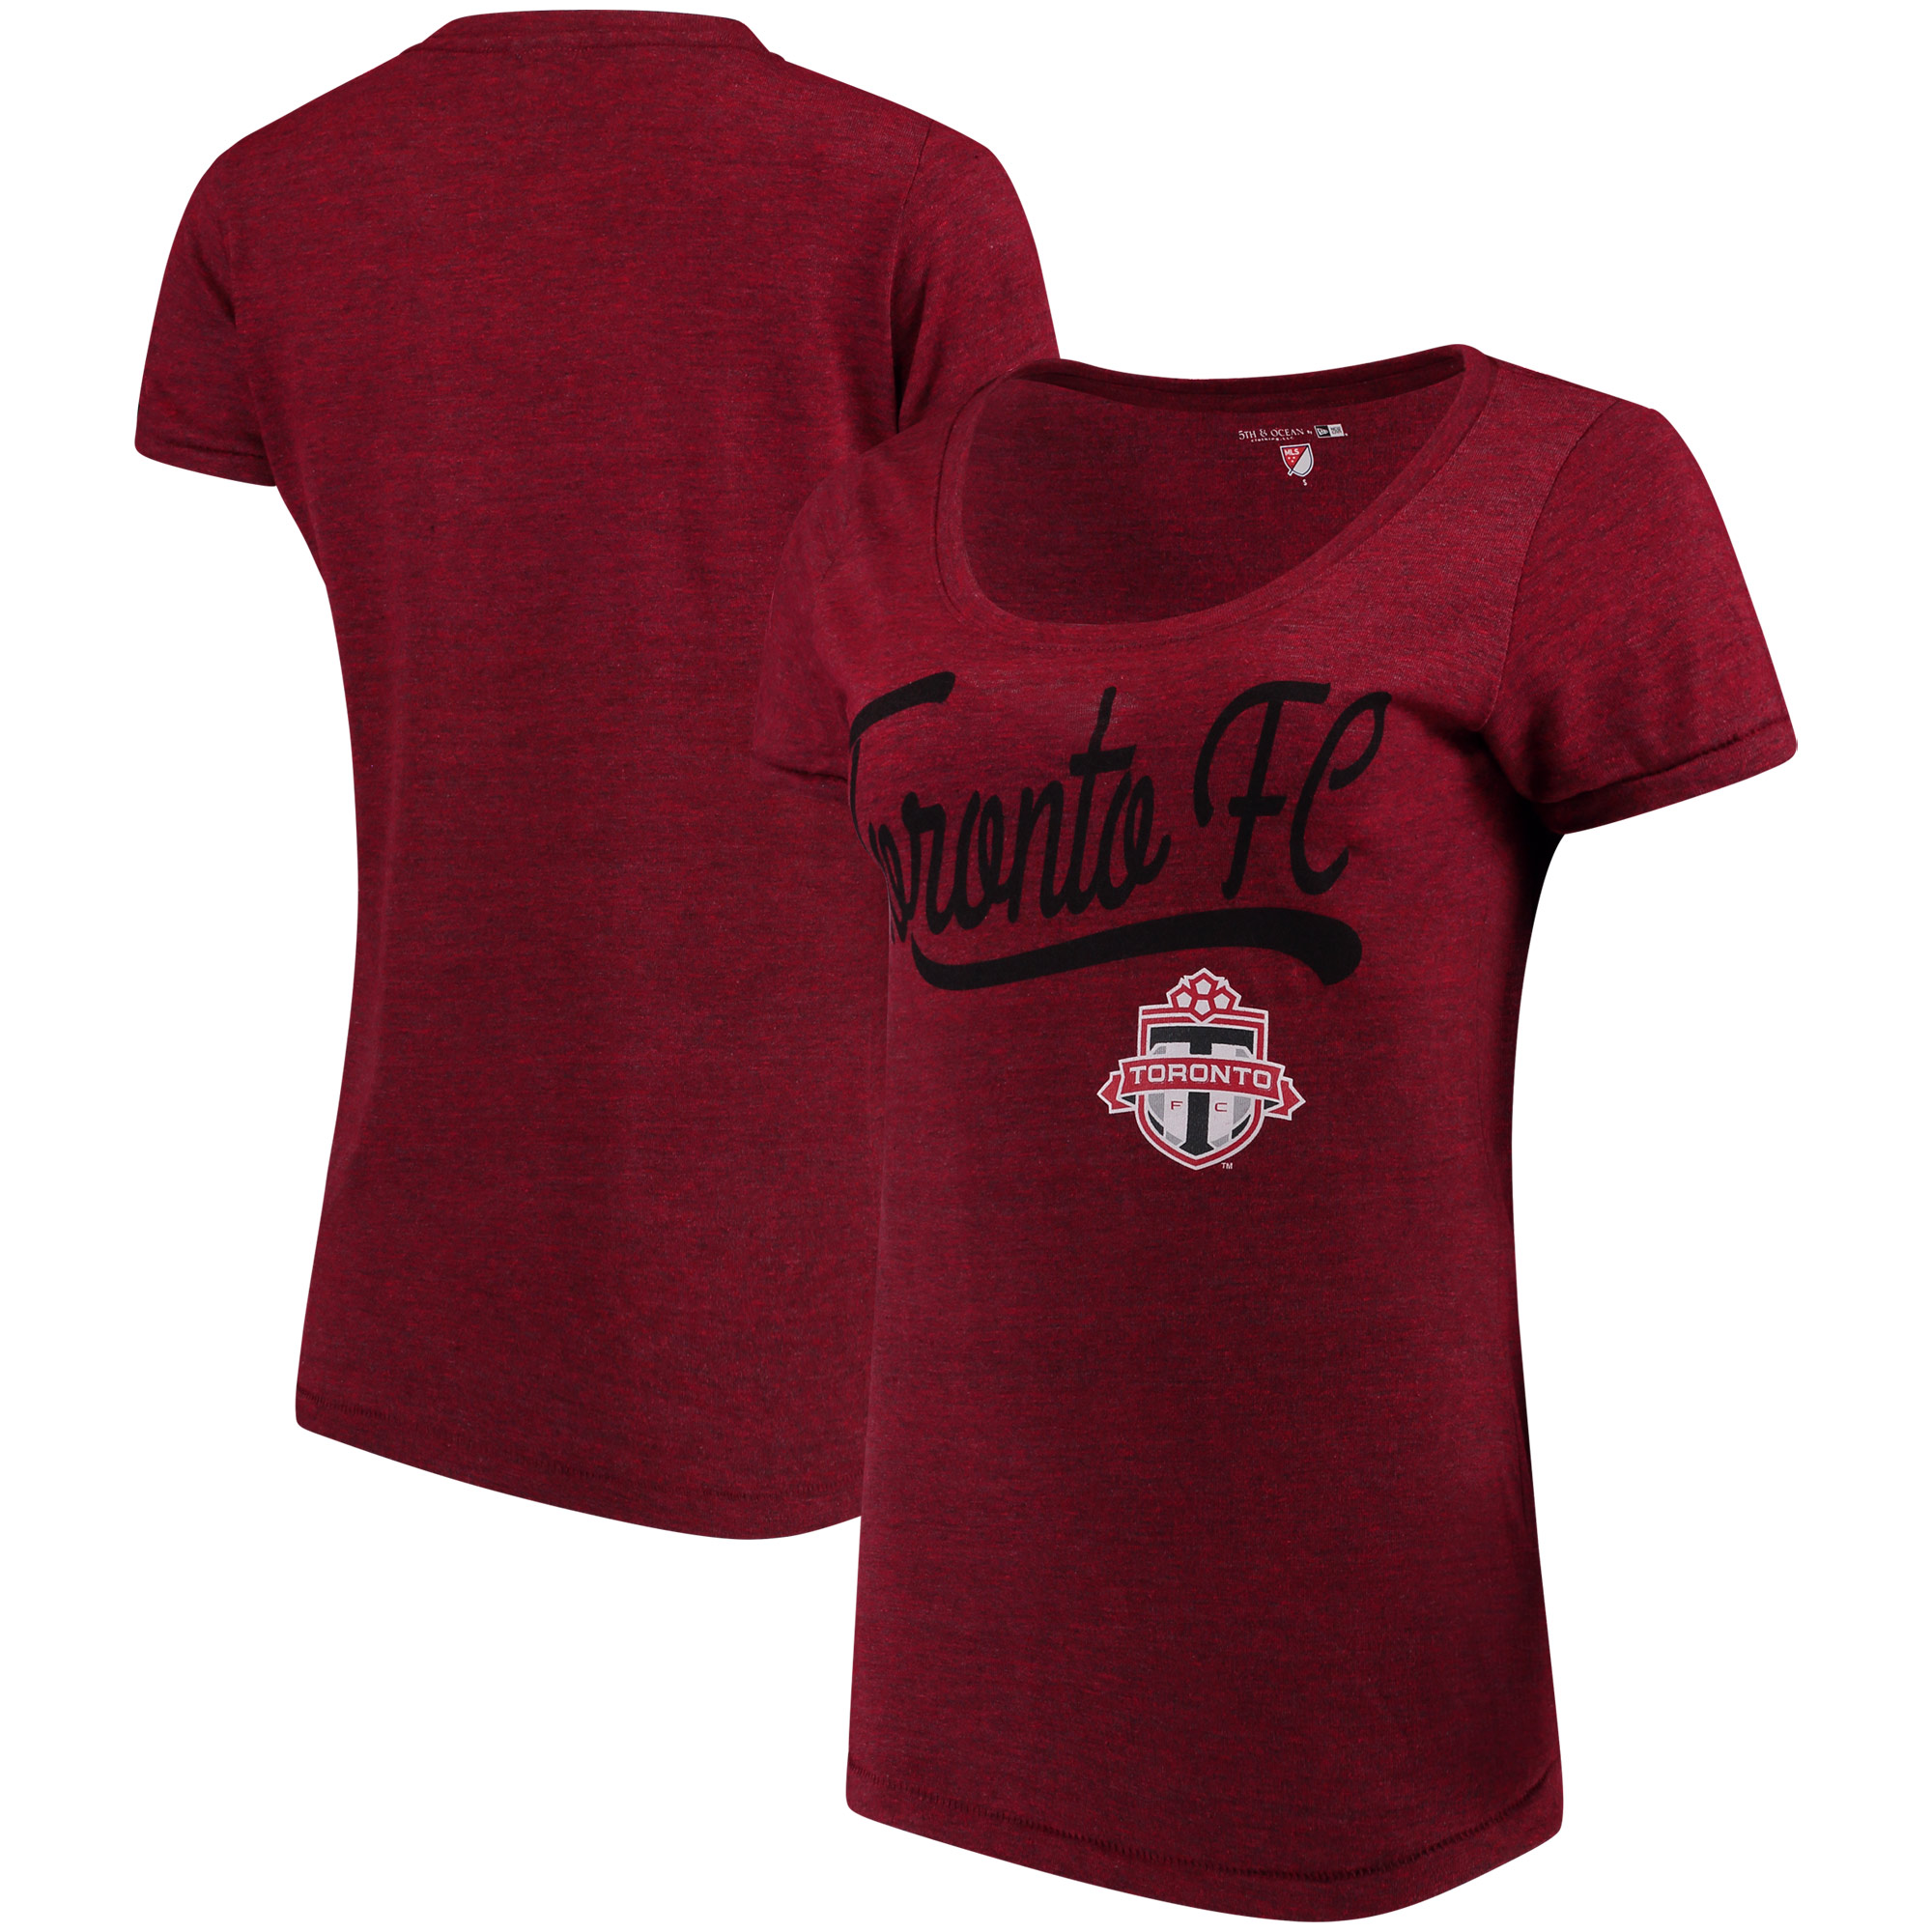 Toronto FC 5th & Ocean by New Era Women's Scoop Neck Tri-Blend T-Shirt - Red